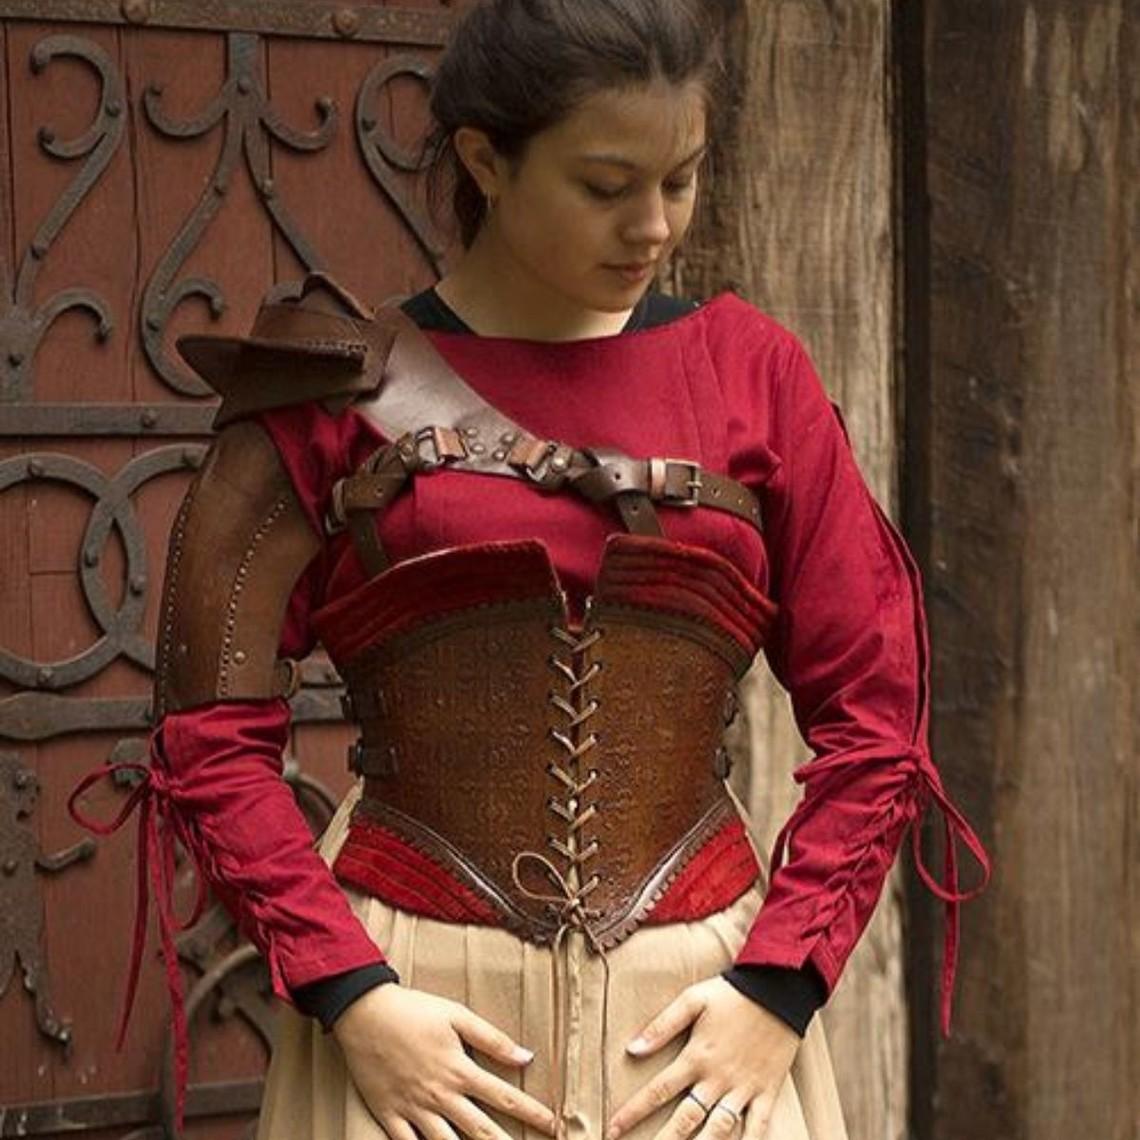 Epic Armoury Corsé de cuero Margot, rojo